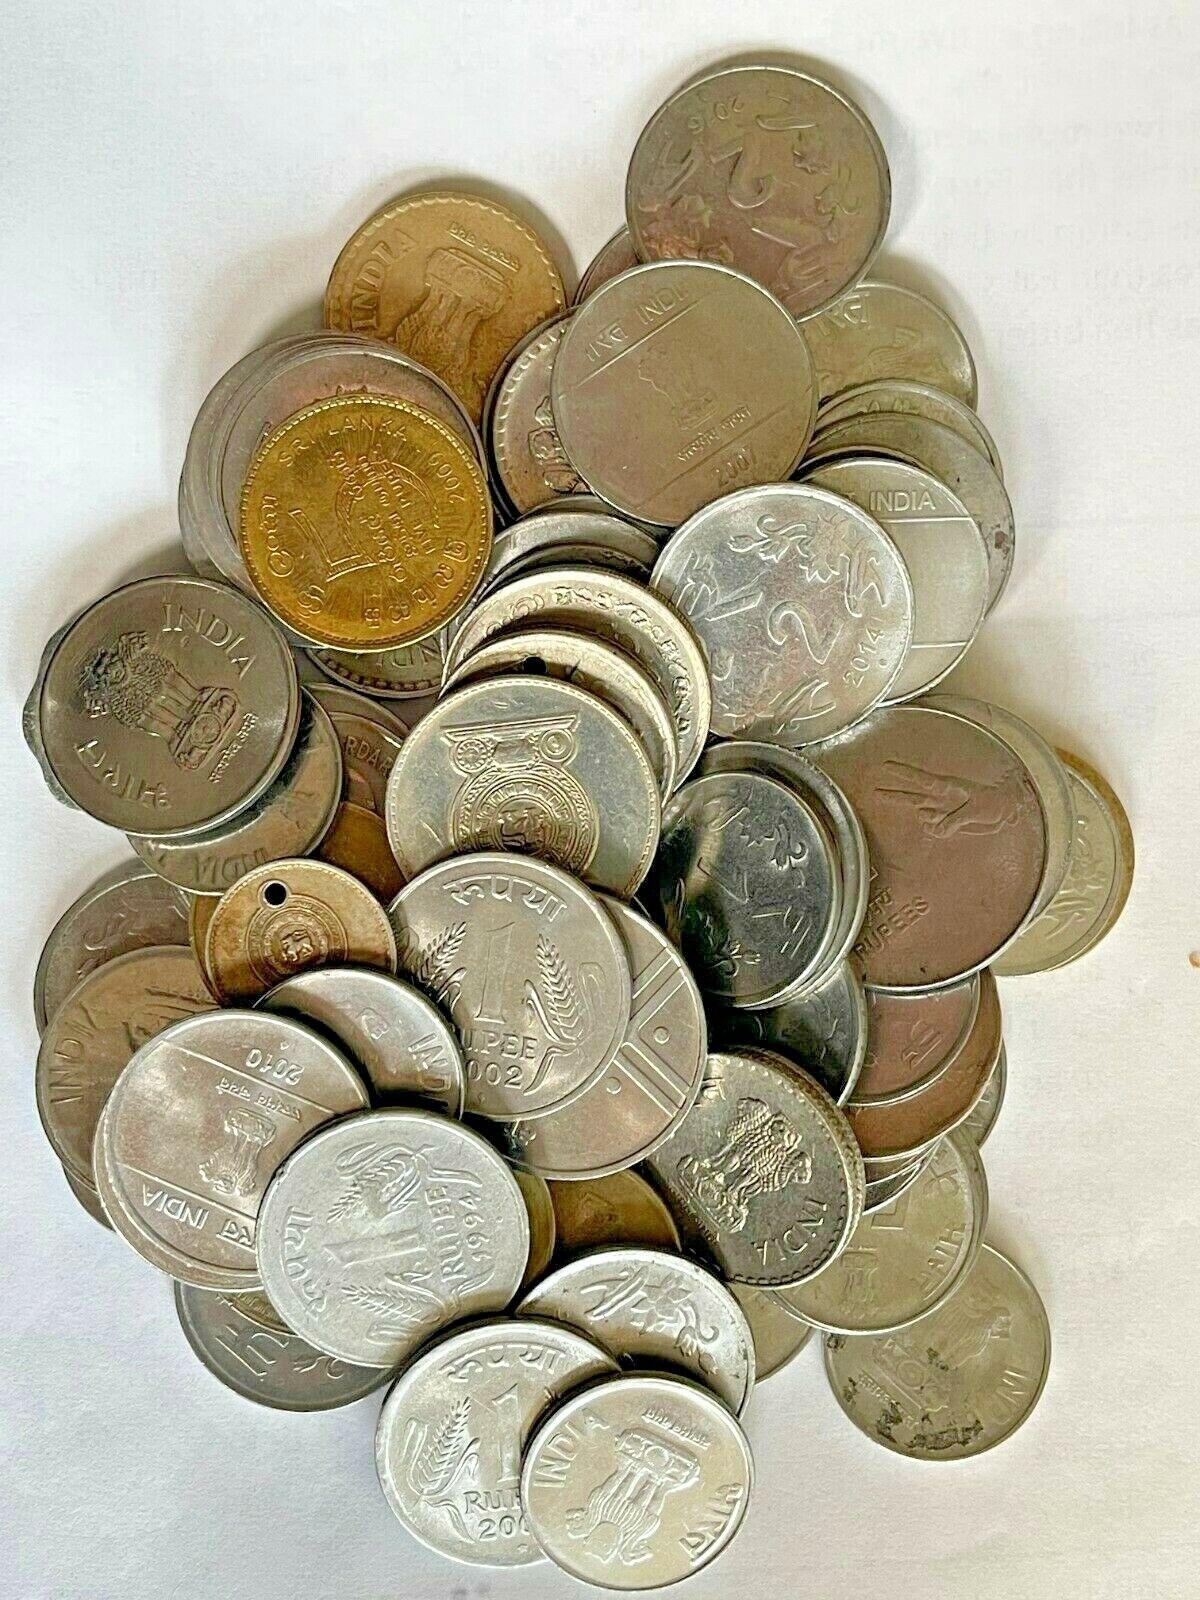 1 Lb Coin Lot INDIA - $19.95